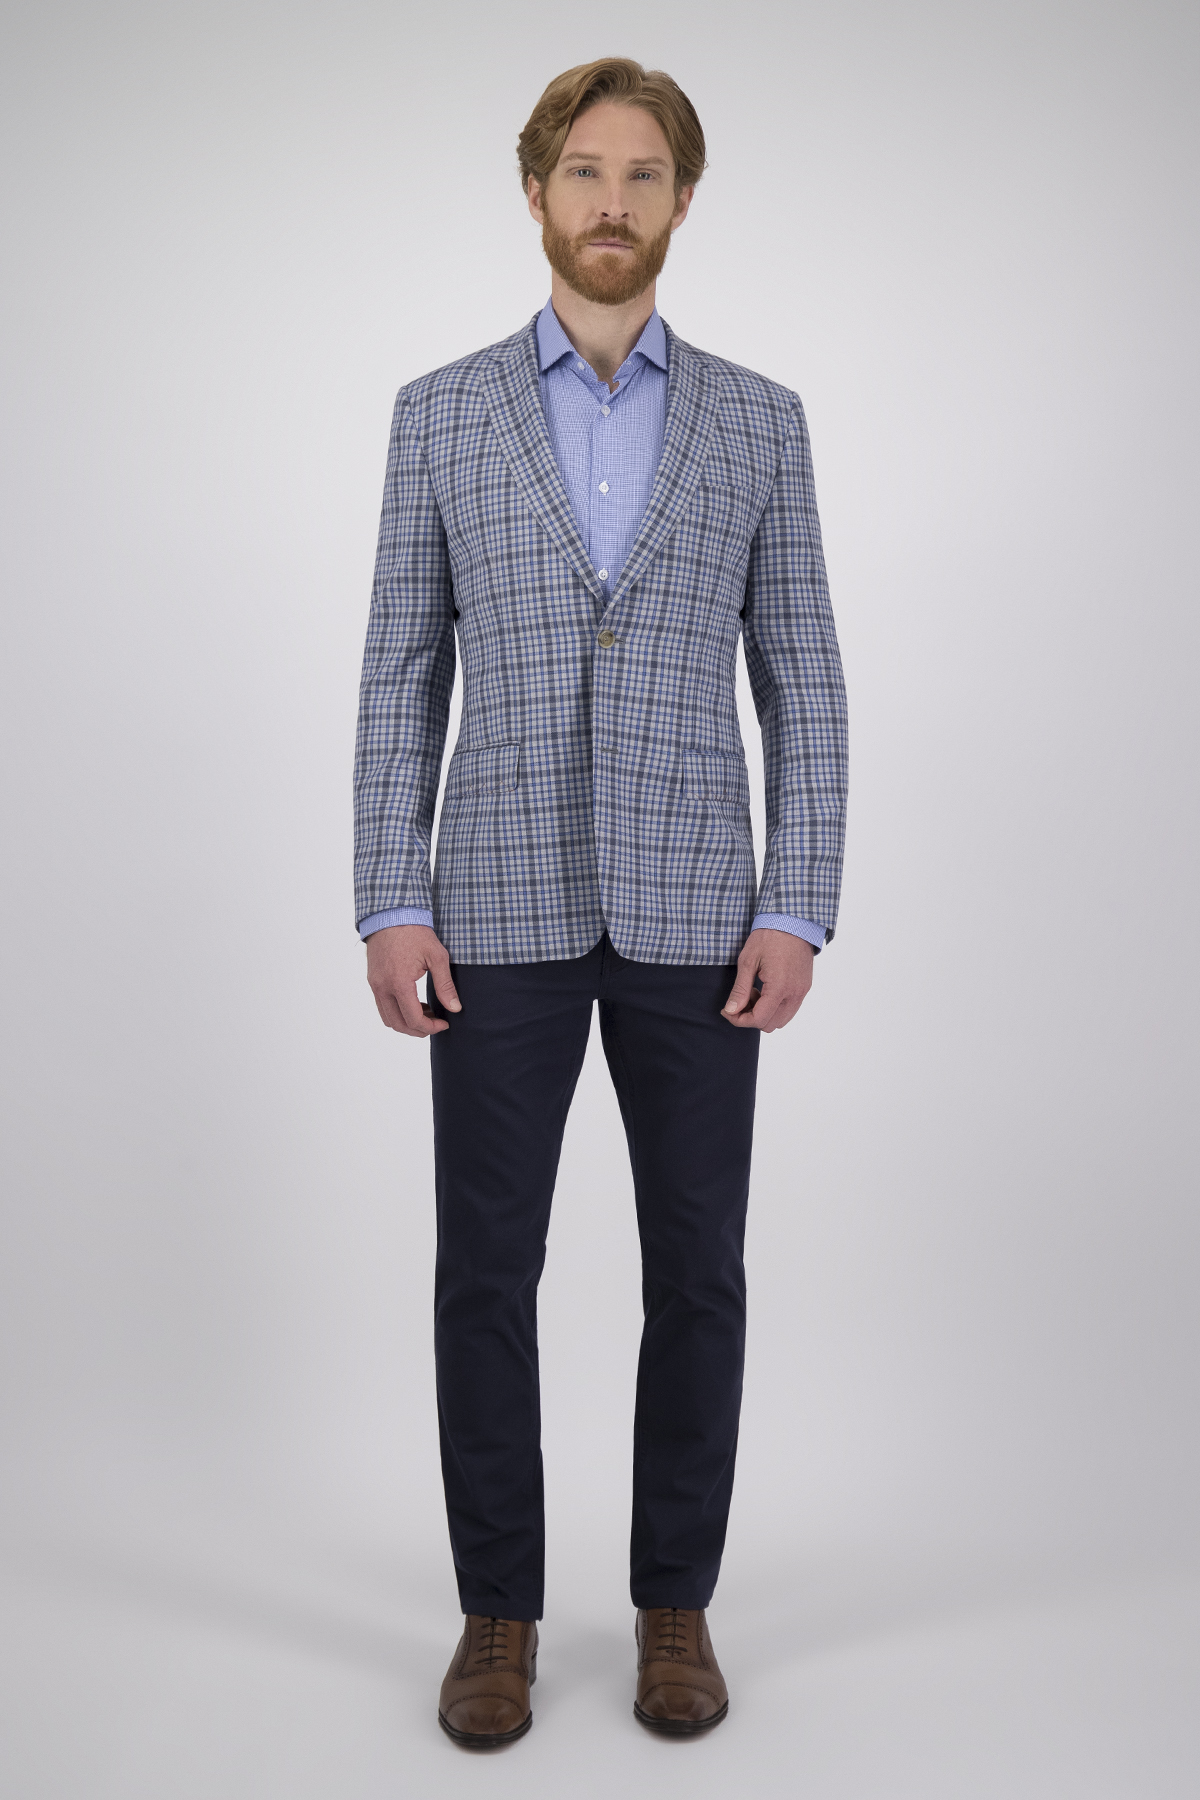 Saco Calderoni Couture Azul a Cuadros Corte Slim, Tejido 100% Lana